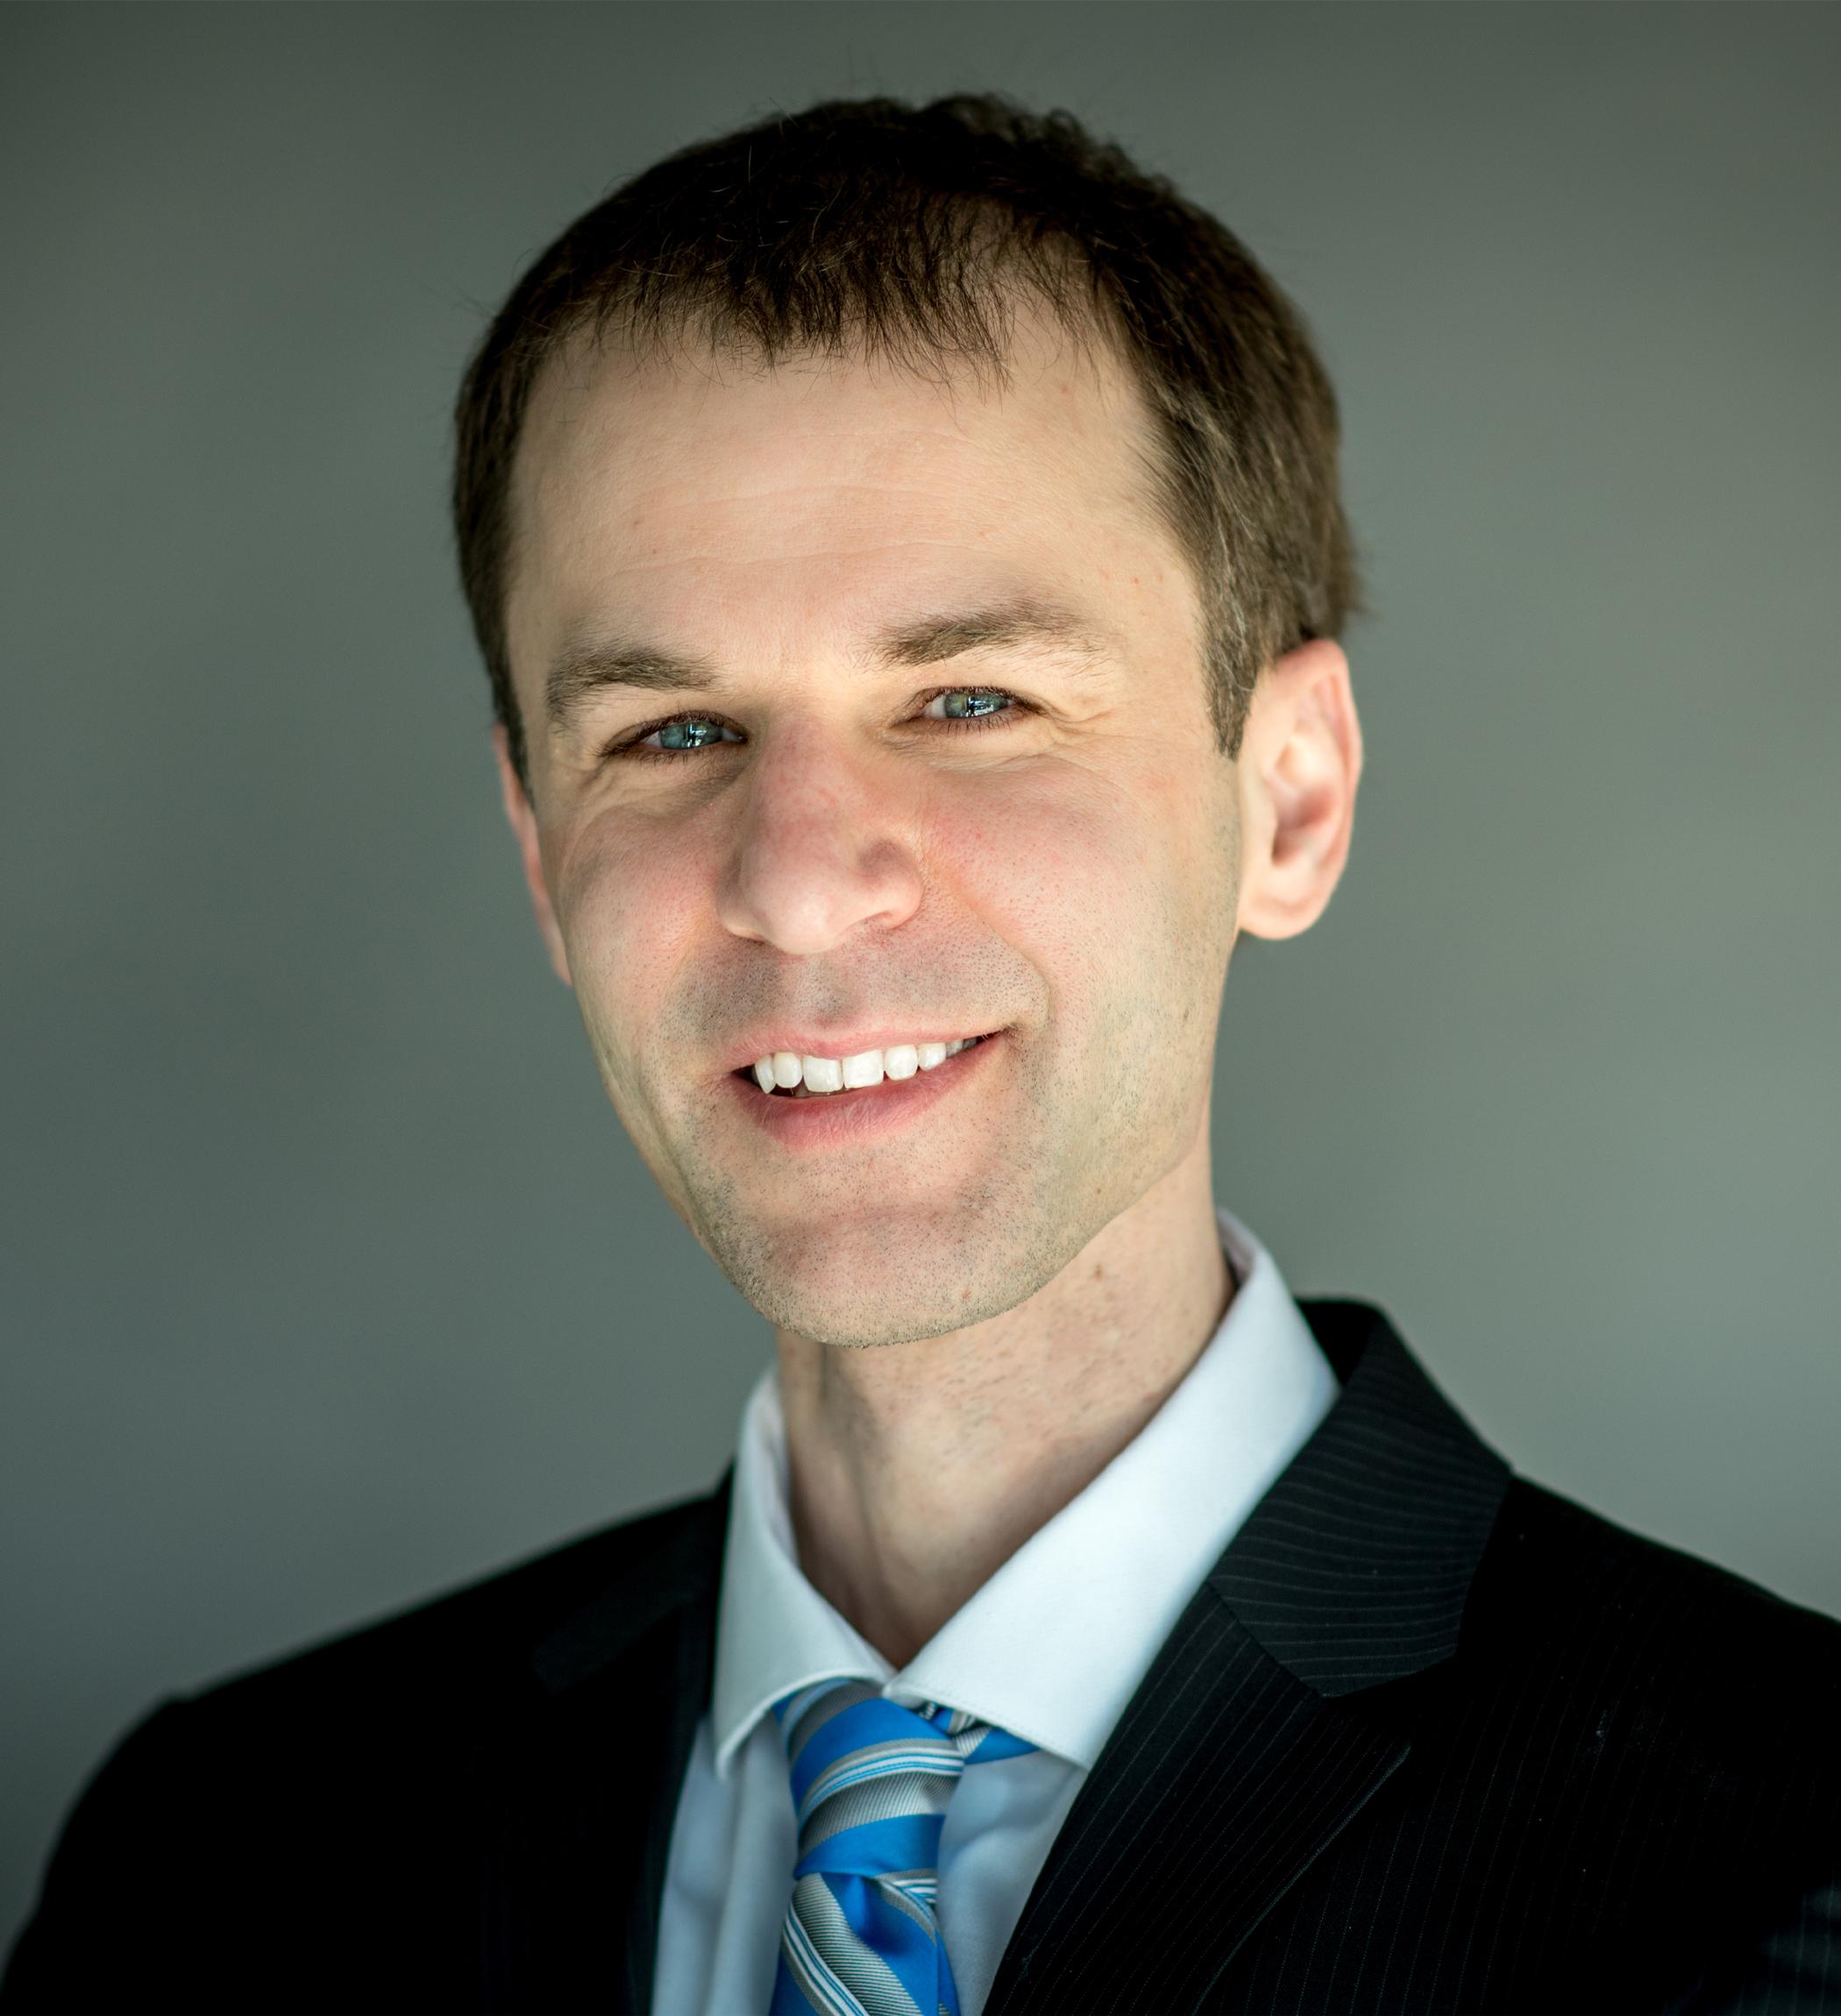 Tim Brown Headshot | Dakota Investments